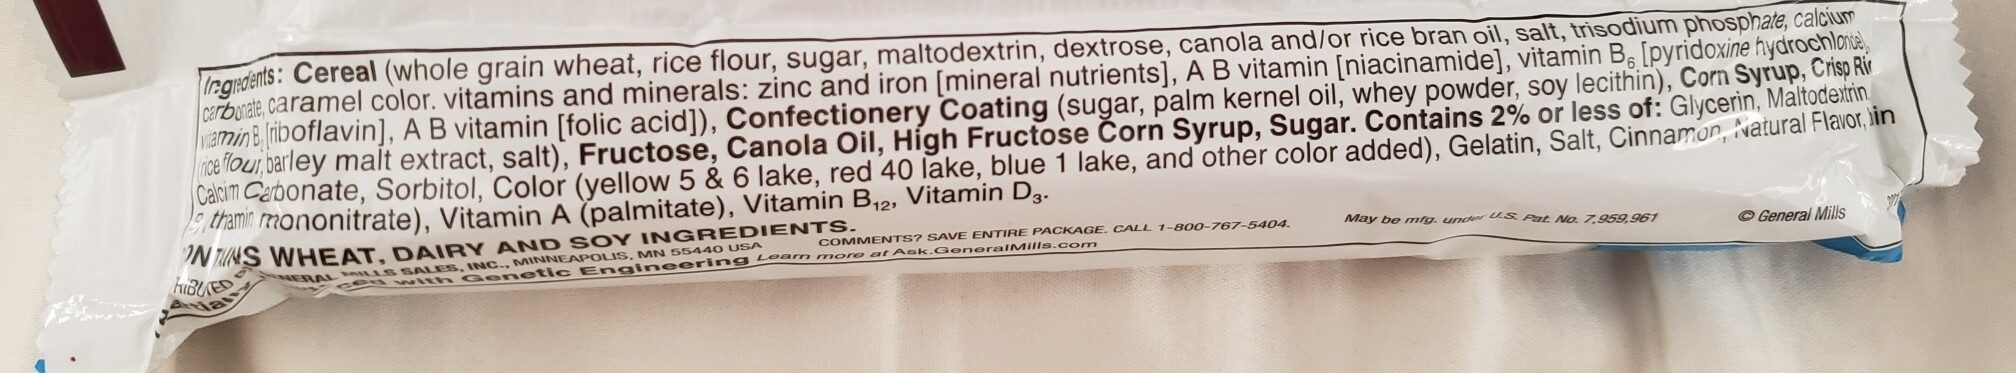 cinnamon toast crunch treats - Ingredients